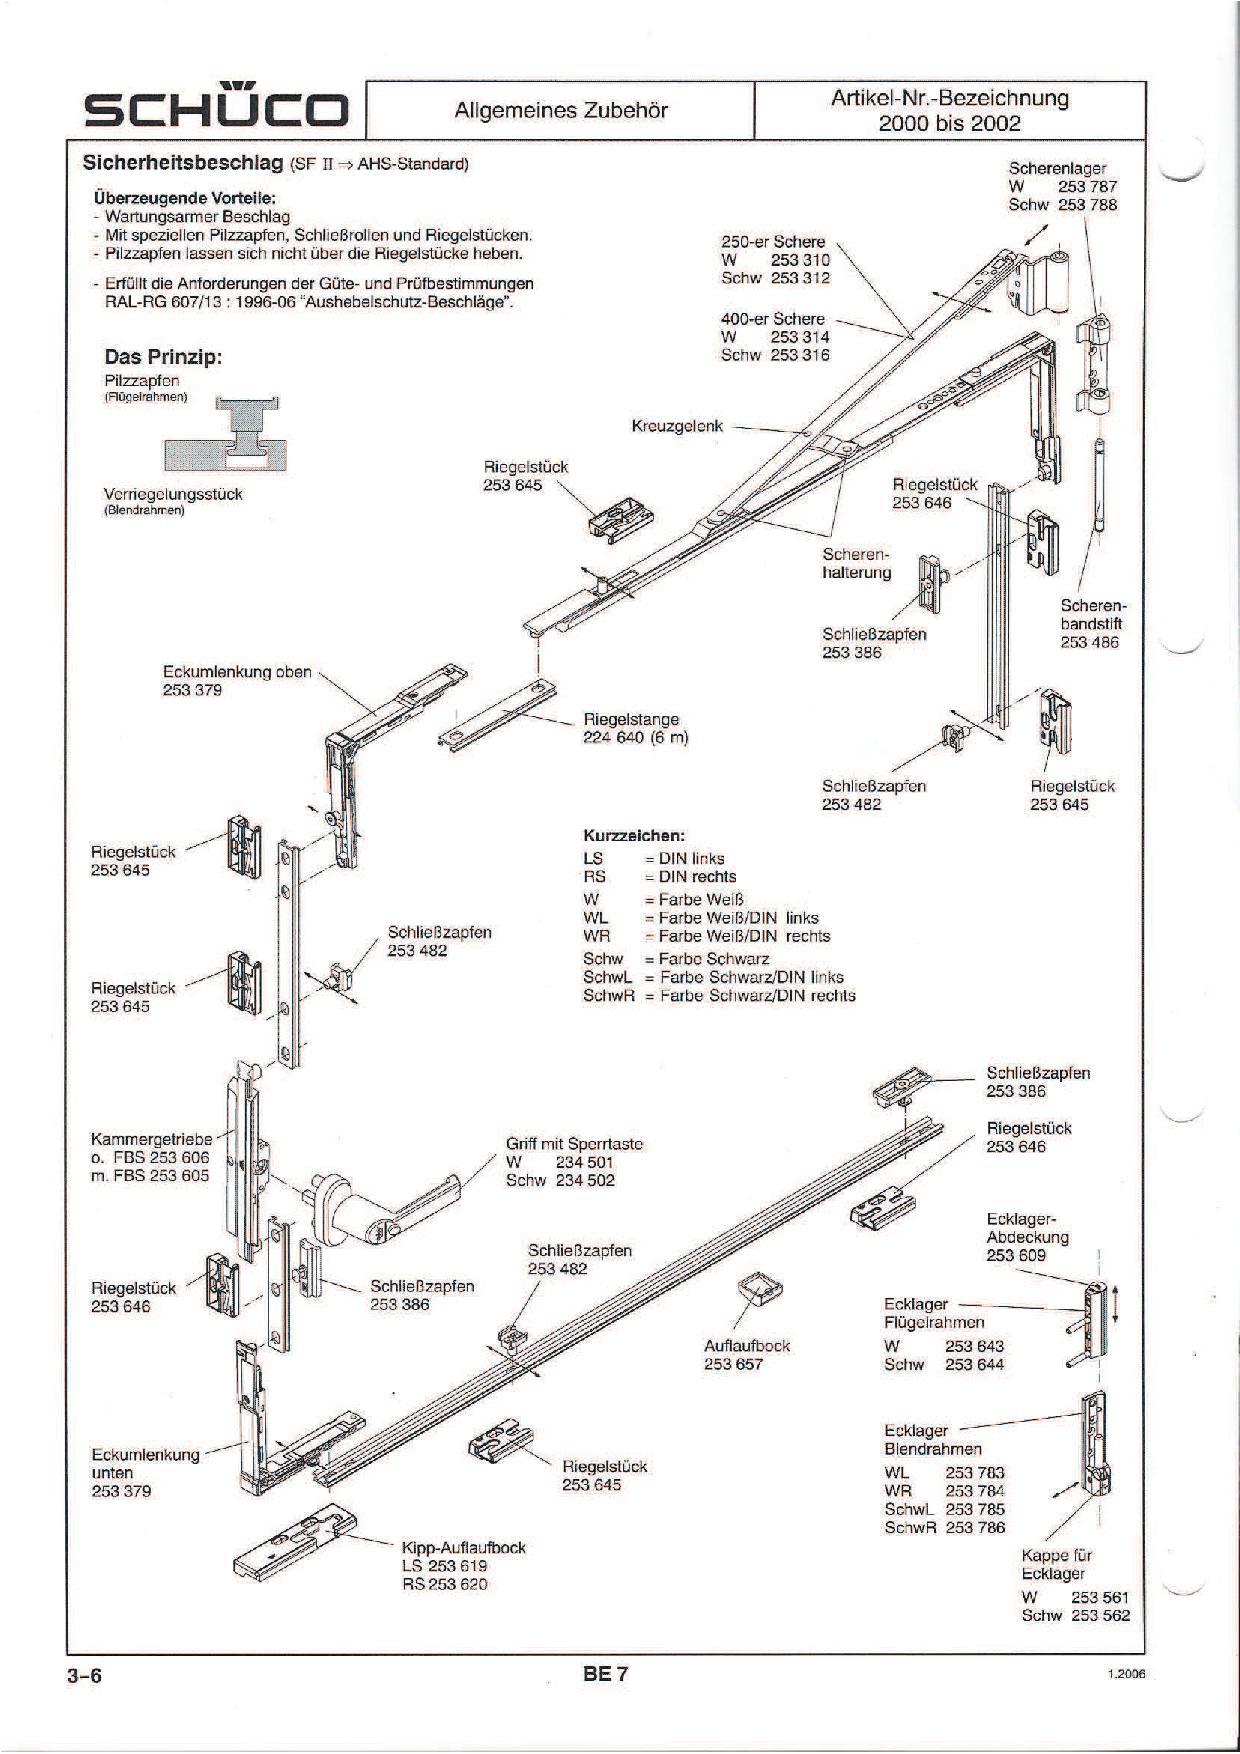 sch co pdf datei fenster 2000 2002 sf2. Black Bedroom Furniture Sets. Home Design Ideas